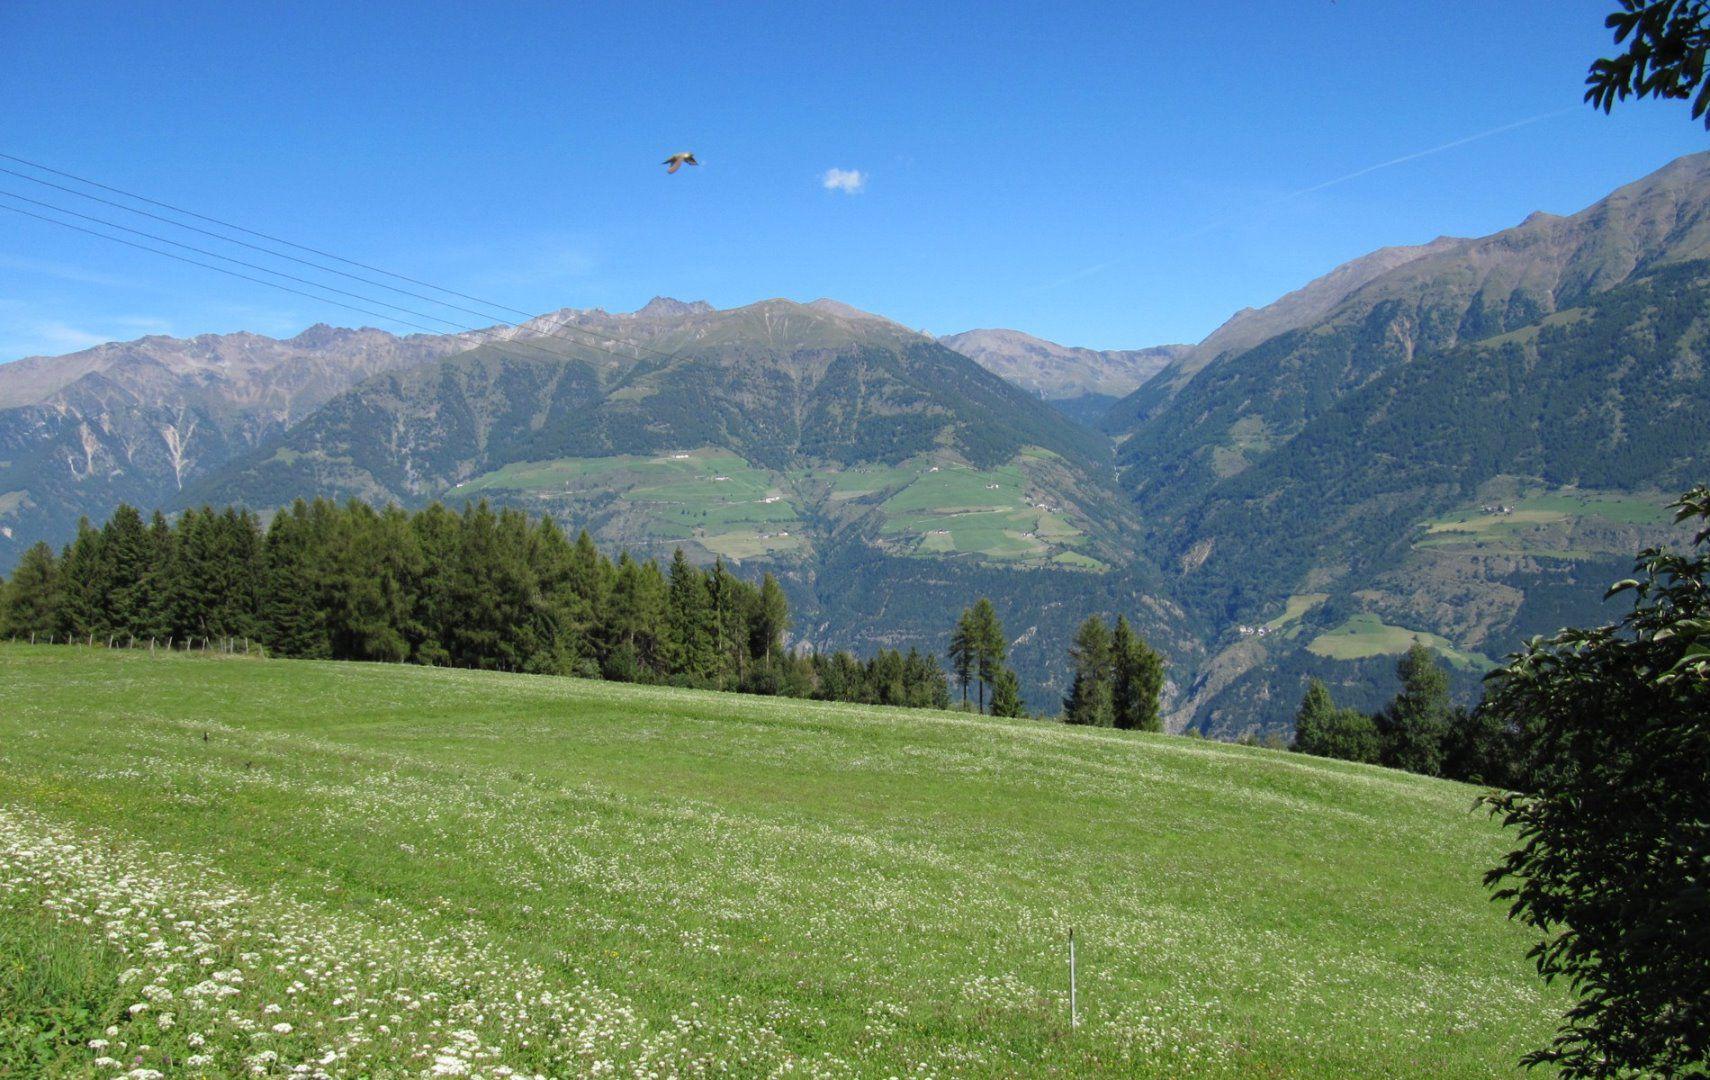 mtb-holyhansen-trail-panorama-schlanders-laas-tvsl.jpg